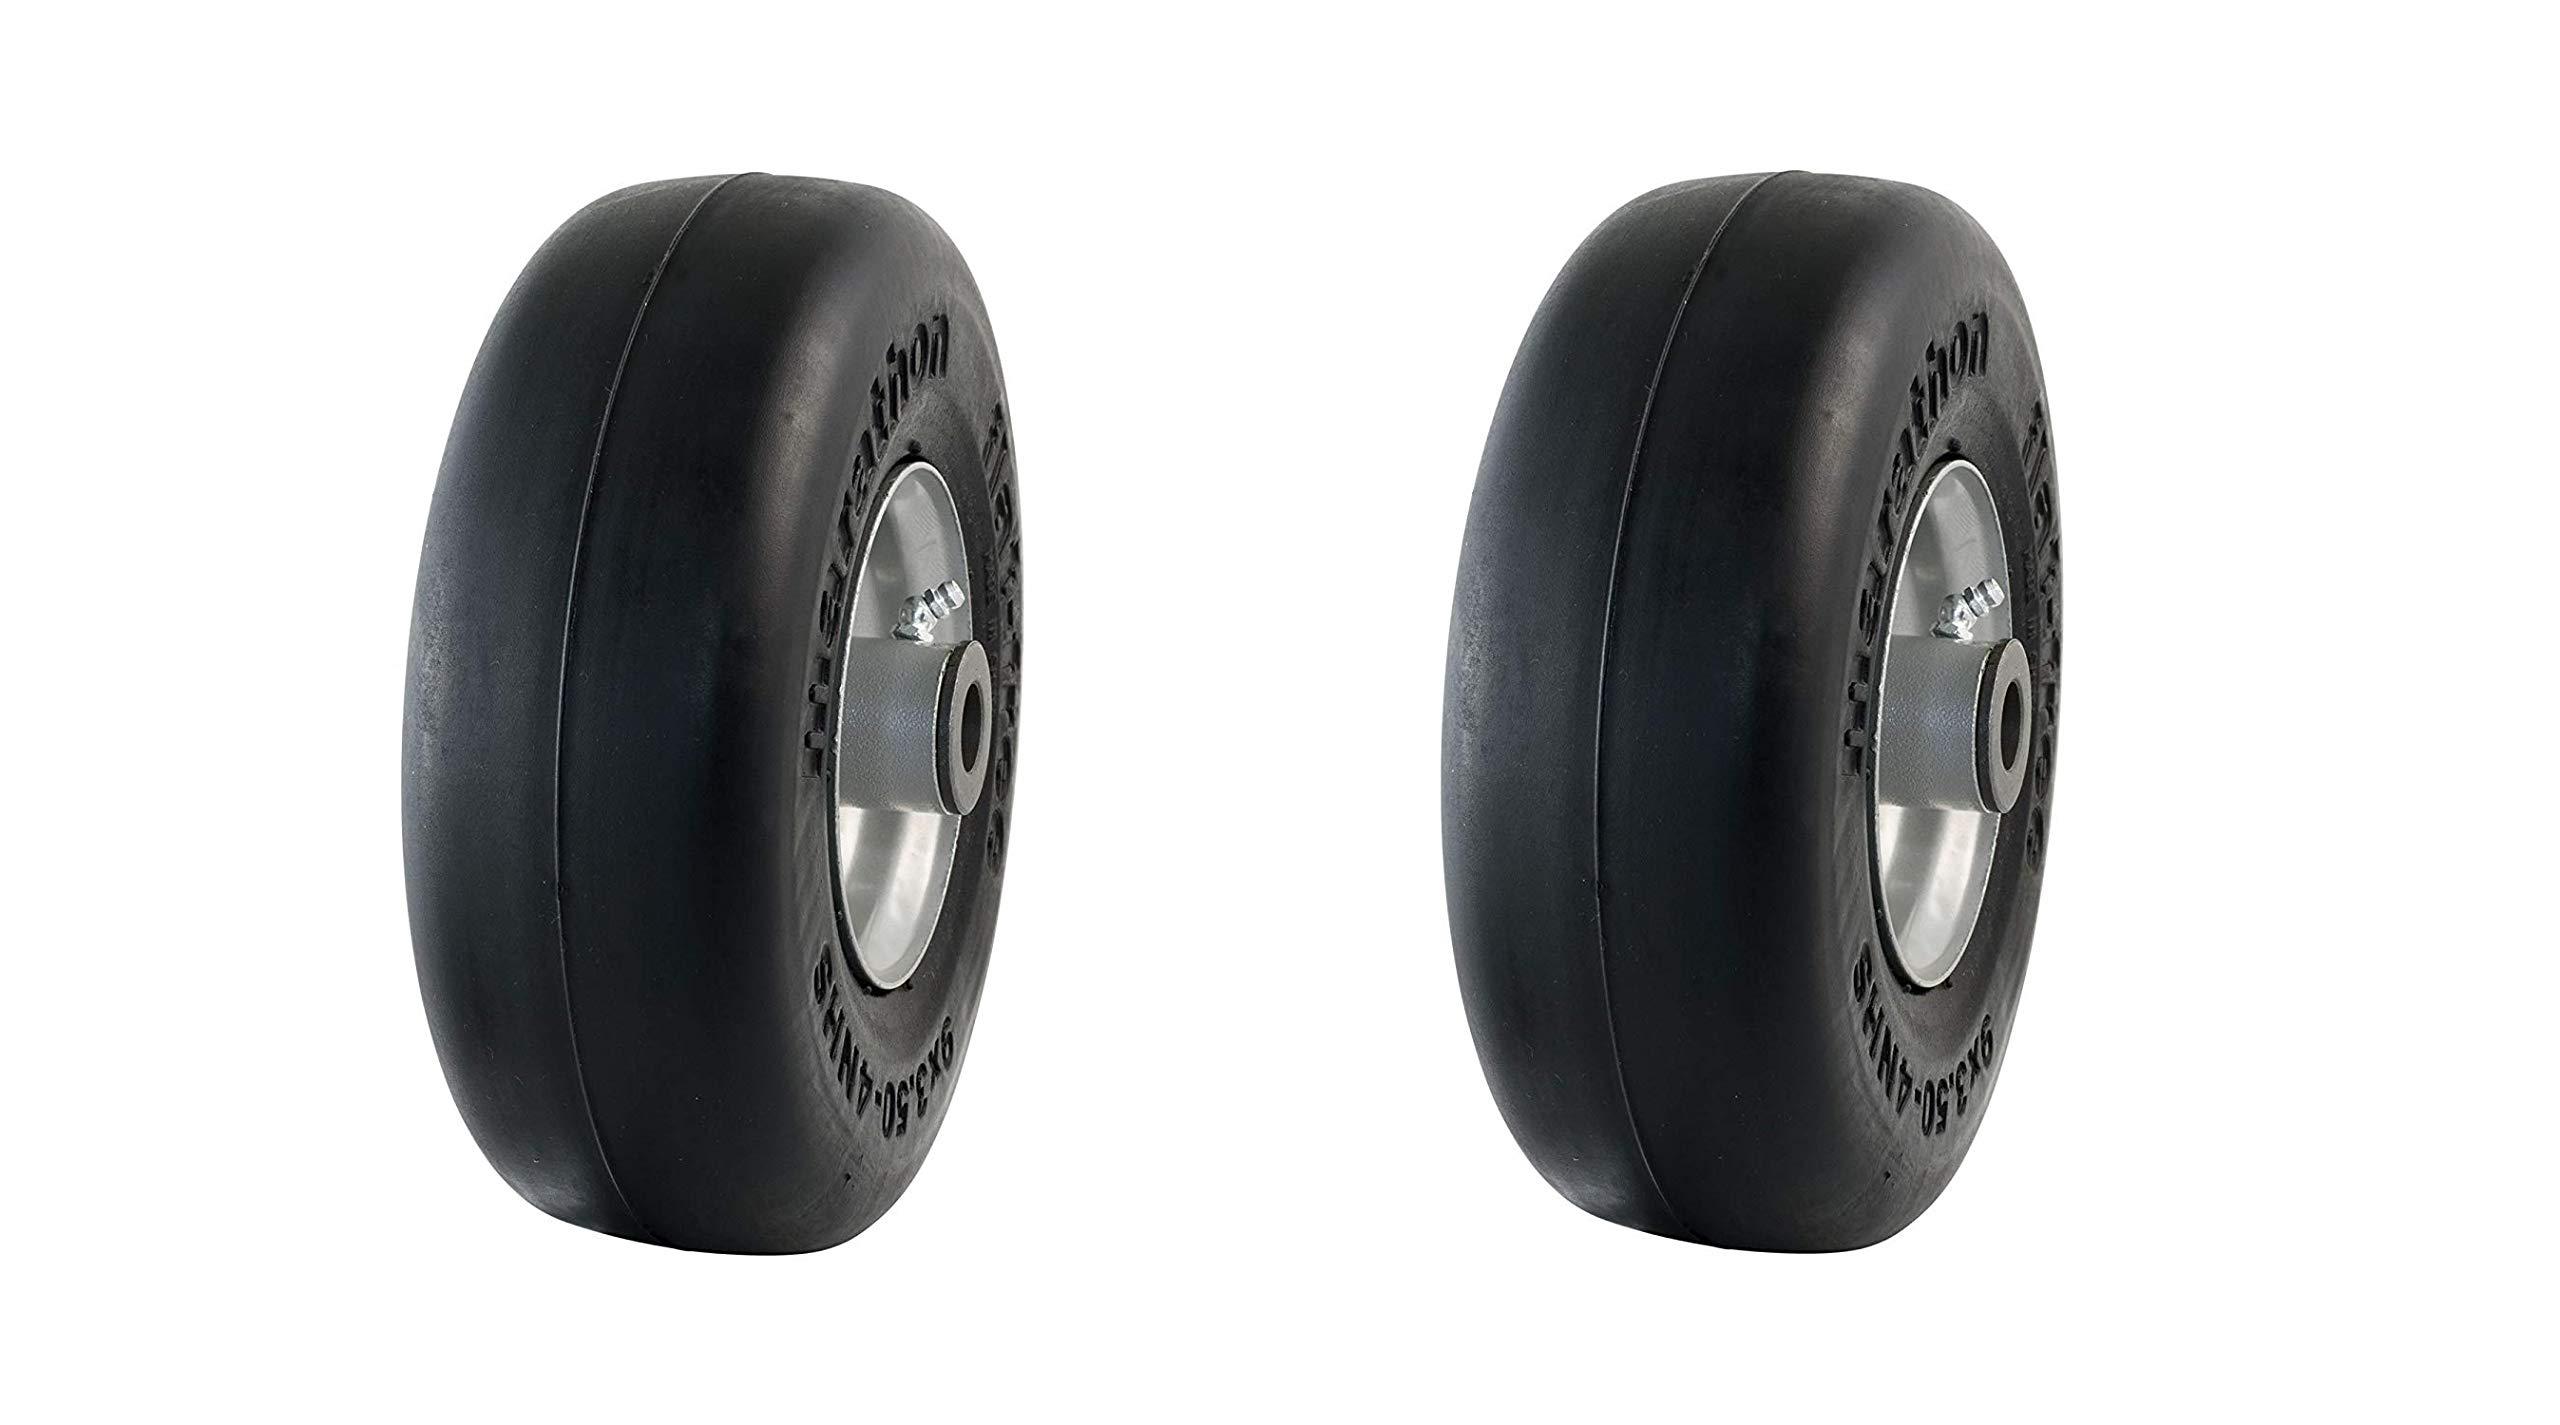 Marathon 9x3.50-4'' Flat Free Tire on Wheel, 4'' Centered Hub, 3/4'' Bushings (Pack of 2) by Marathon Industries